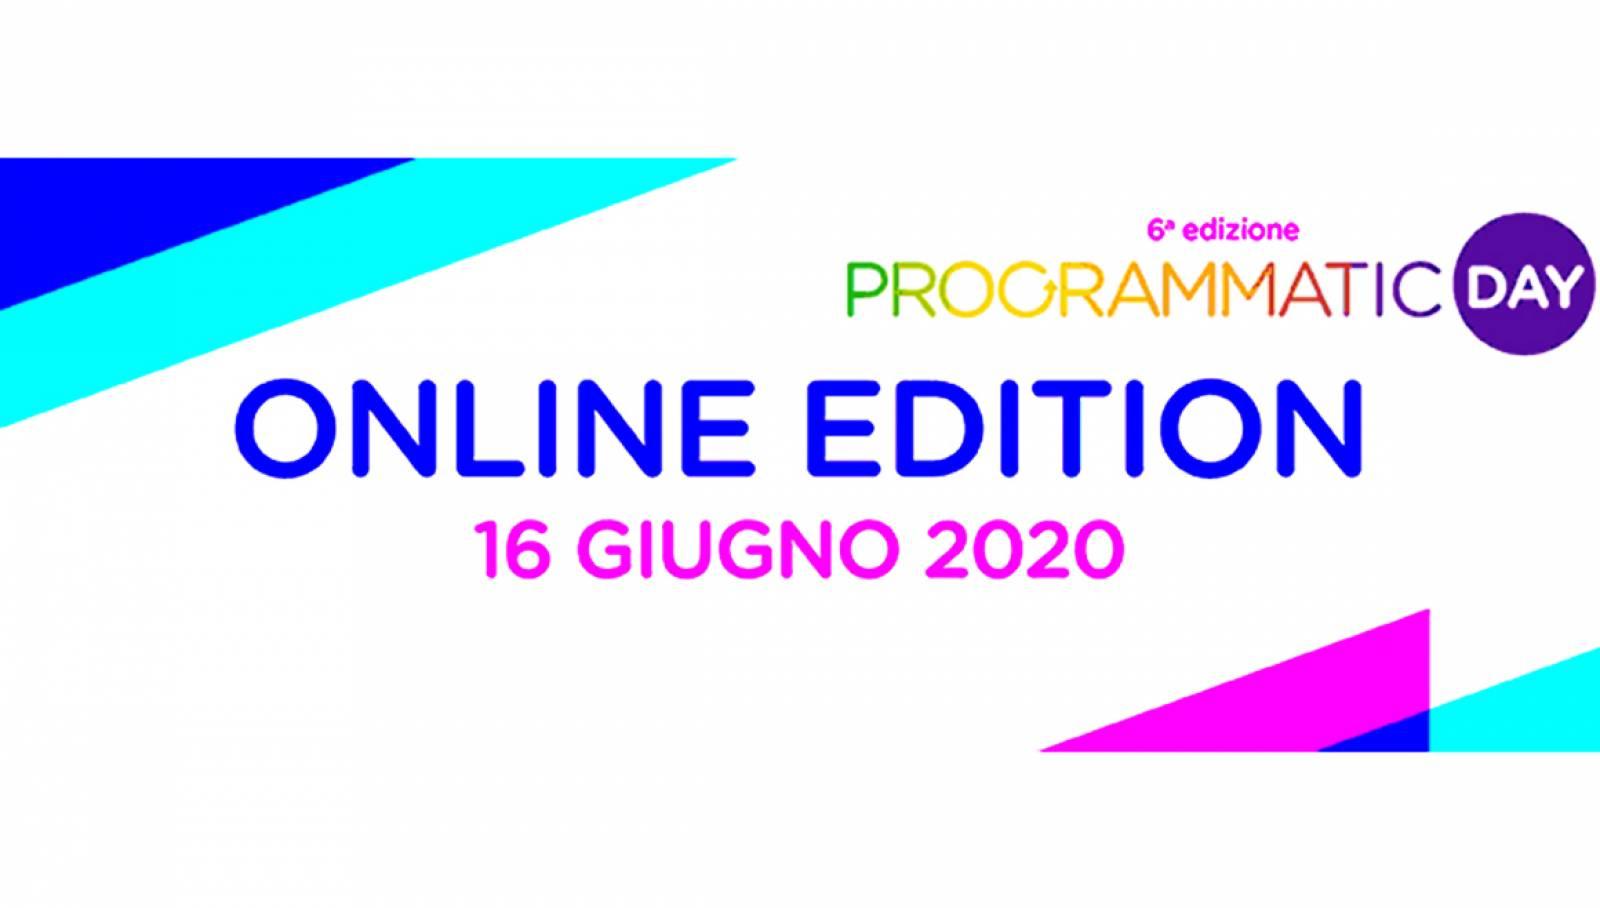 IGPDecaux Main Sponsor Programmatic Day 2020